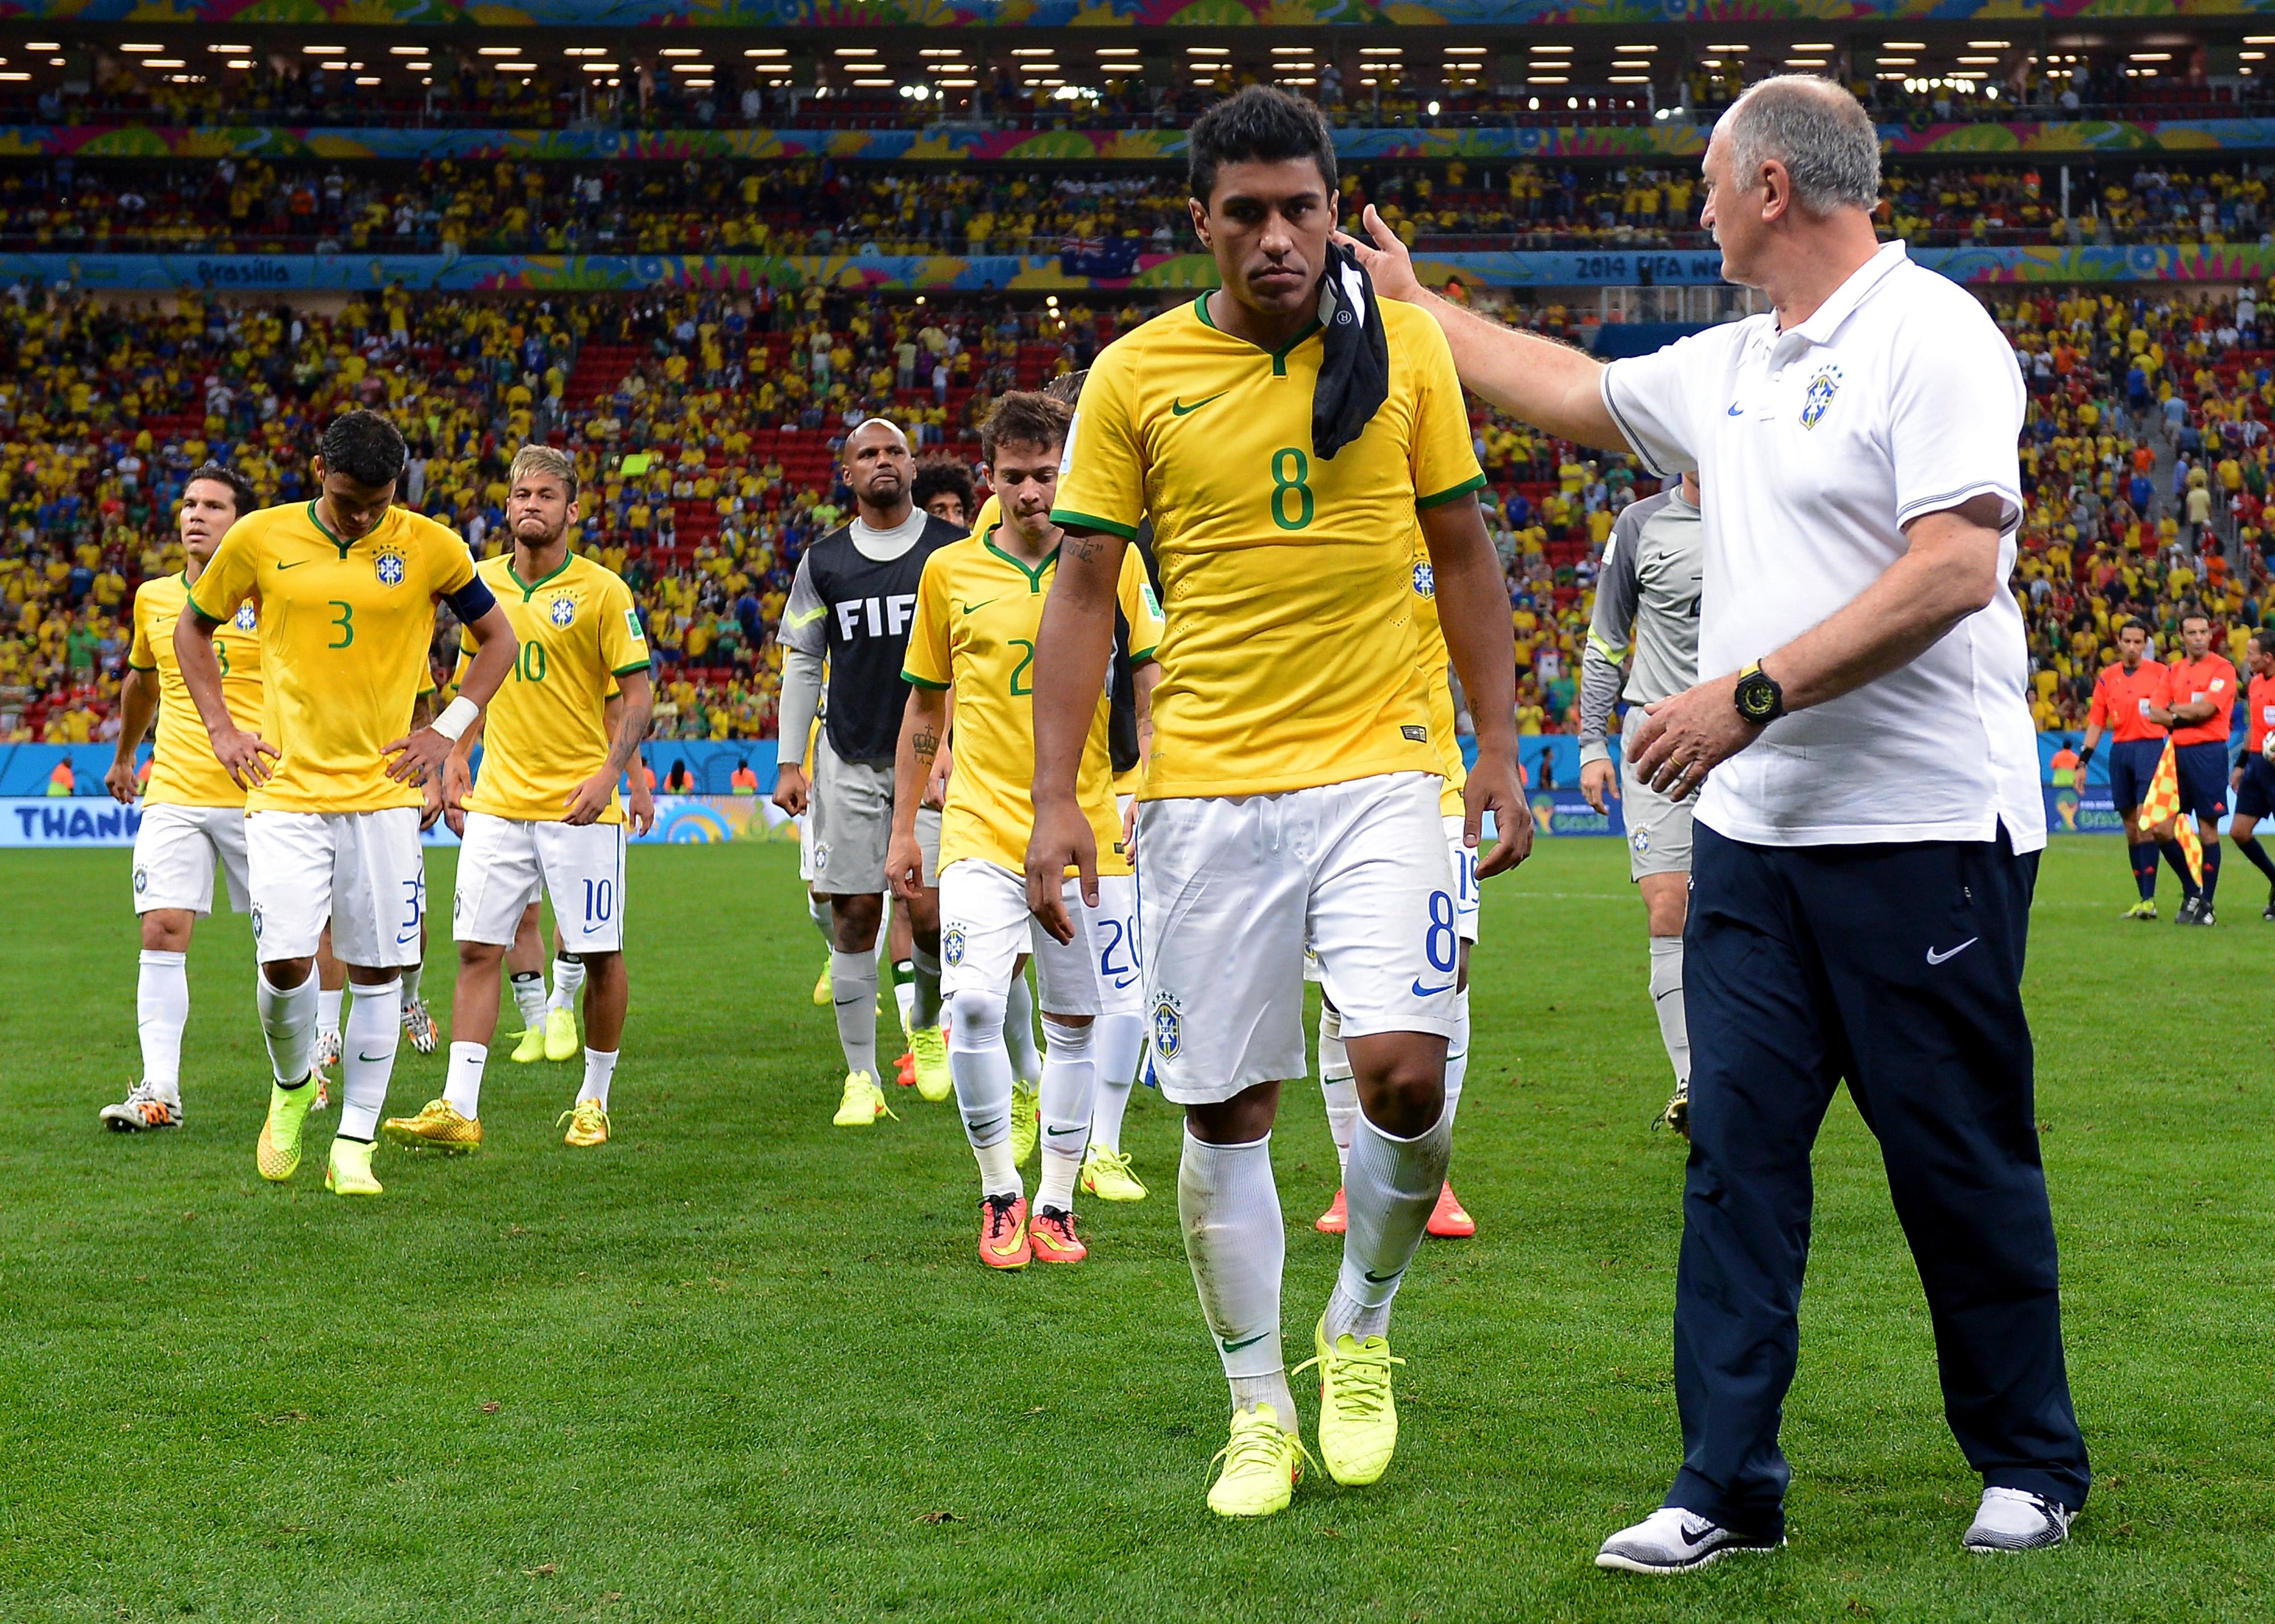 Paulinho and Scolari - Brazil and Netherlands - World Cup 140712